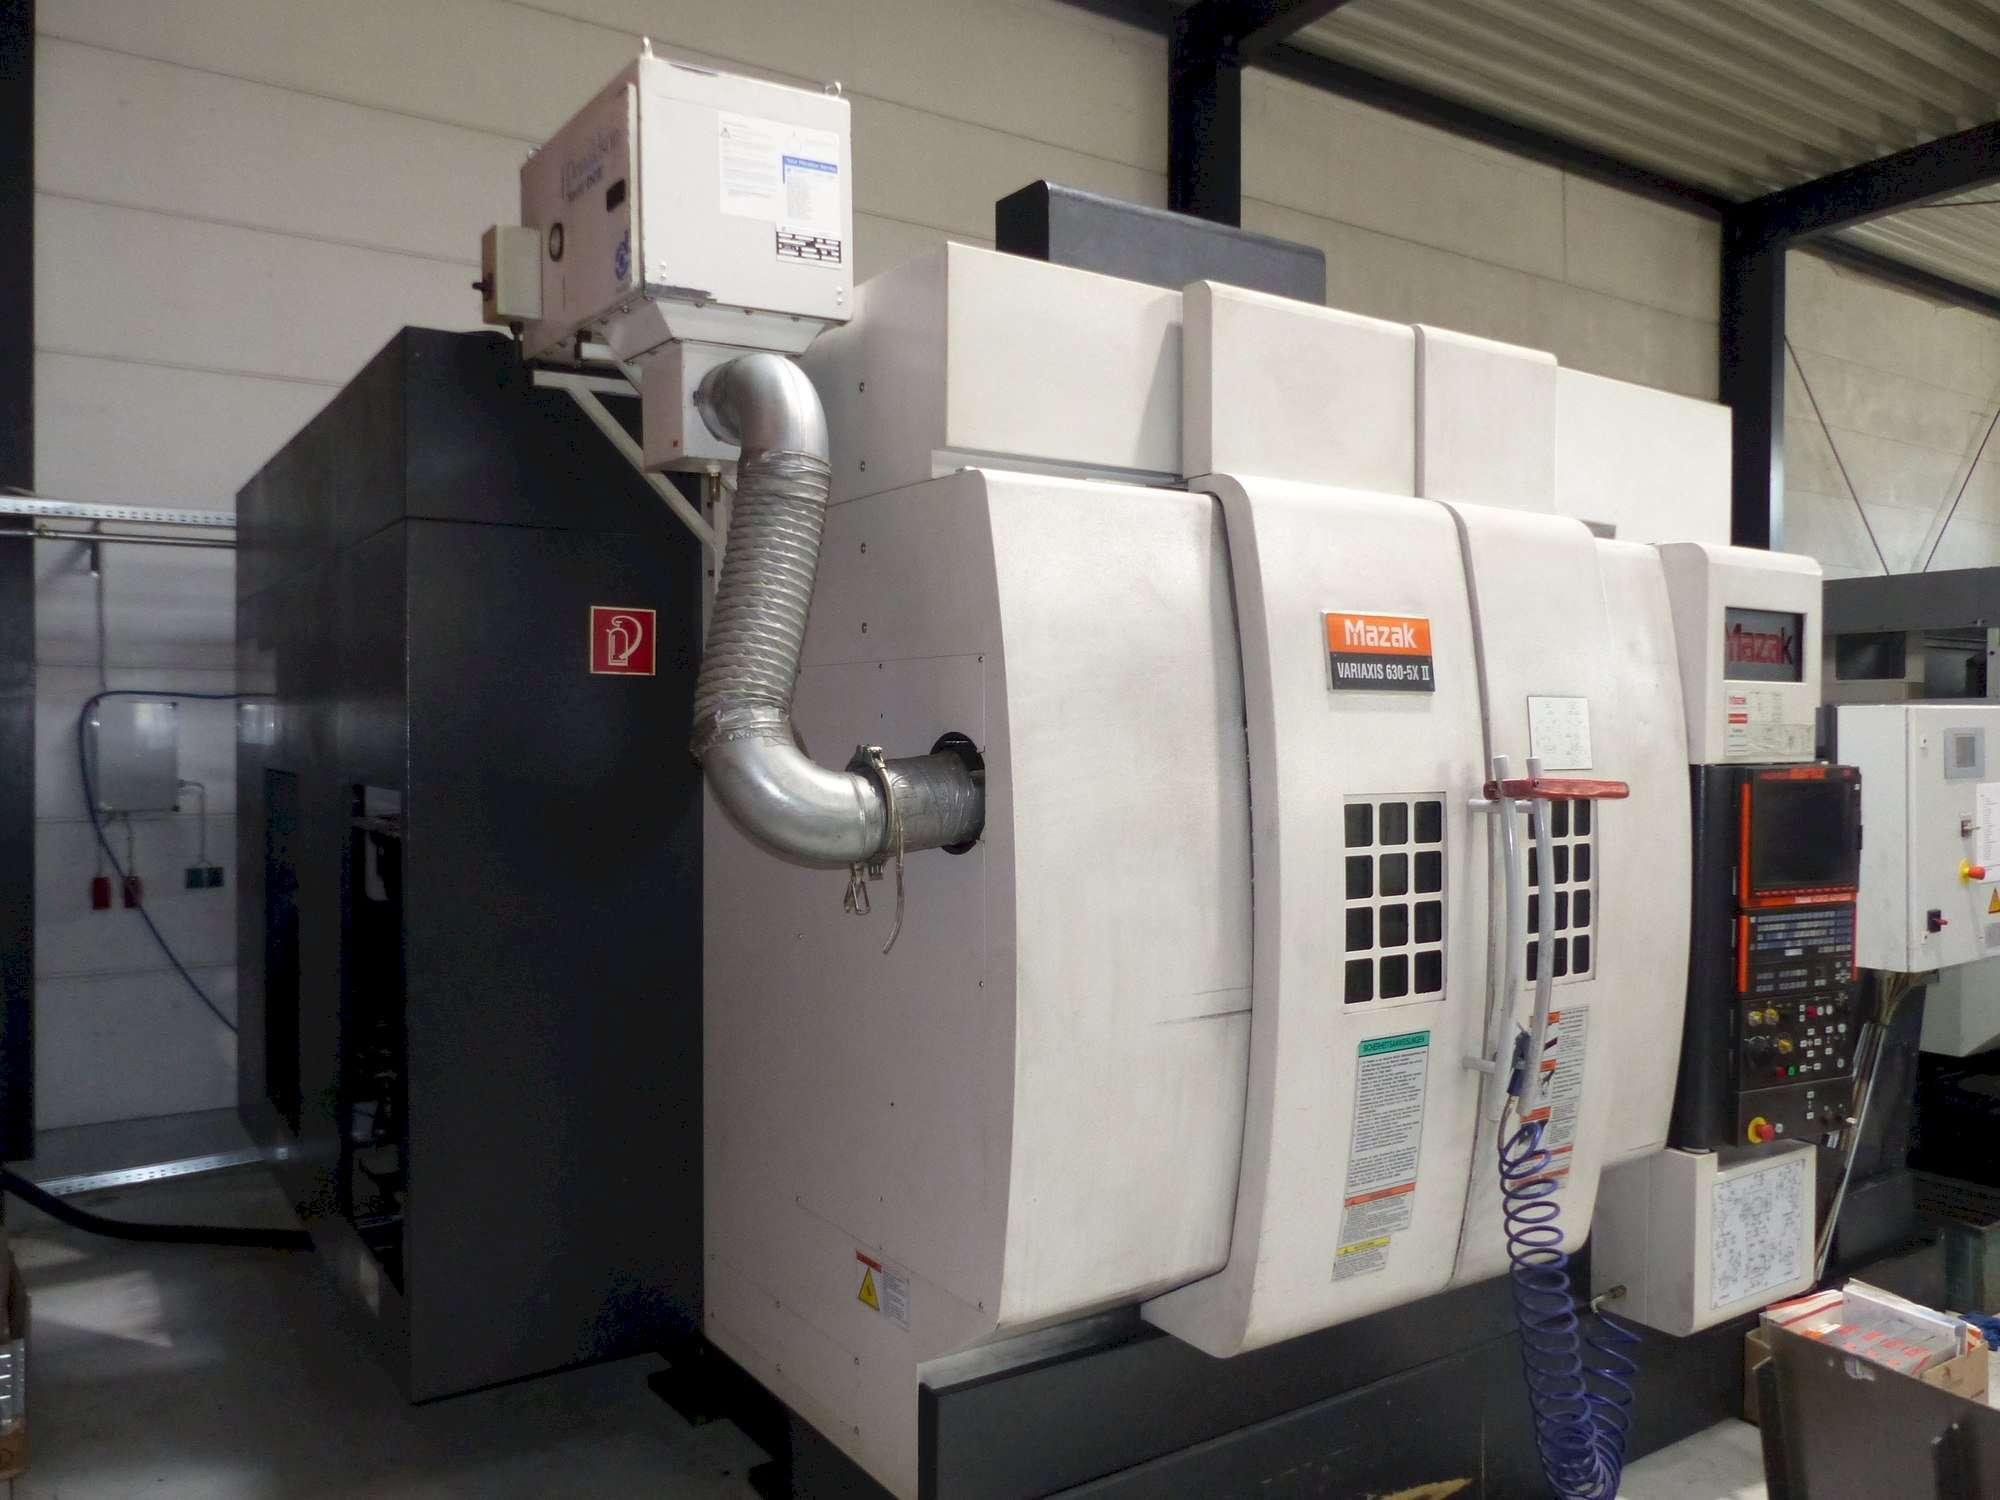 Bearbeitungszentrum - Universal Mazak Variaxis 630-5x II Bilder auf Industry-Pilot